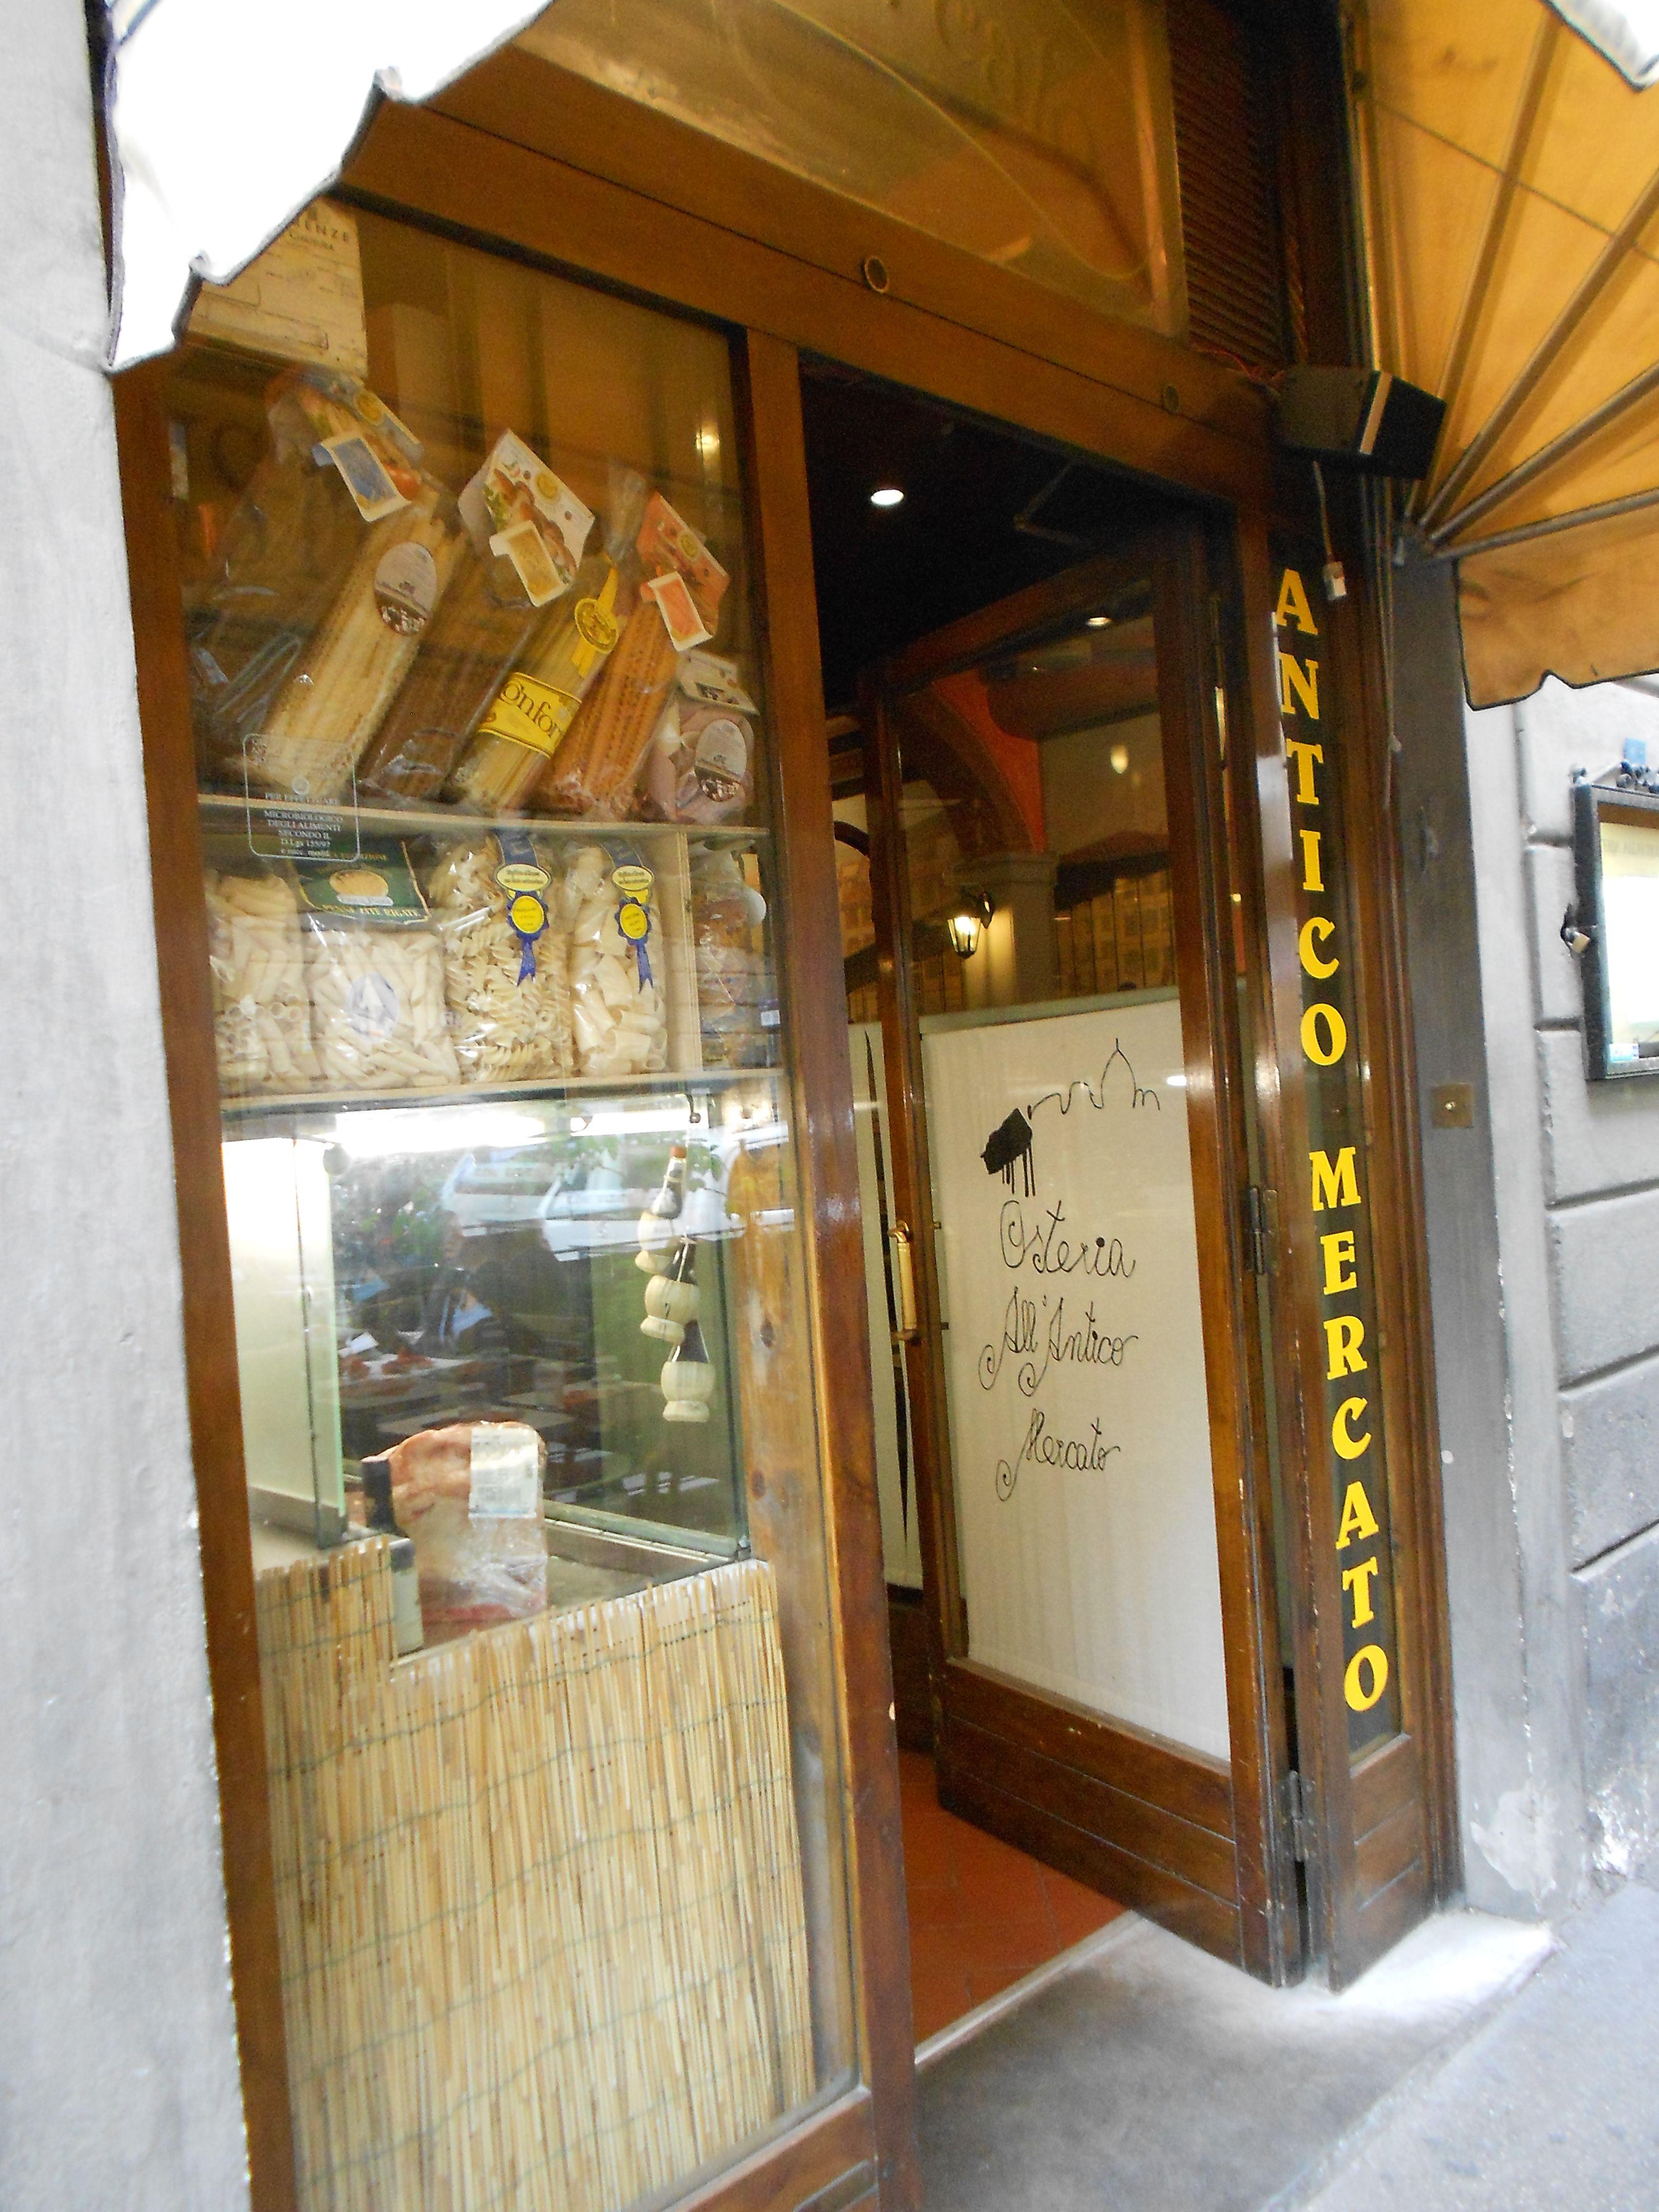 BEST MEAL IN ITALY - Mushroom Ravioli w/Truffle sauce - Antico Mercato, Firenze